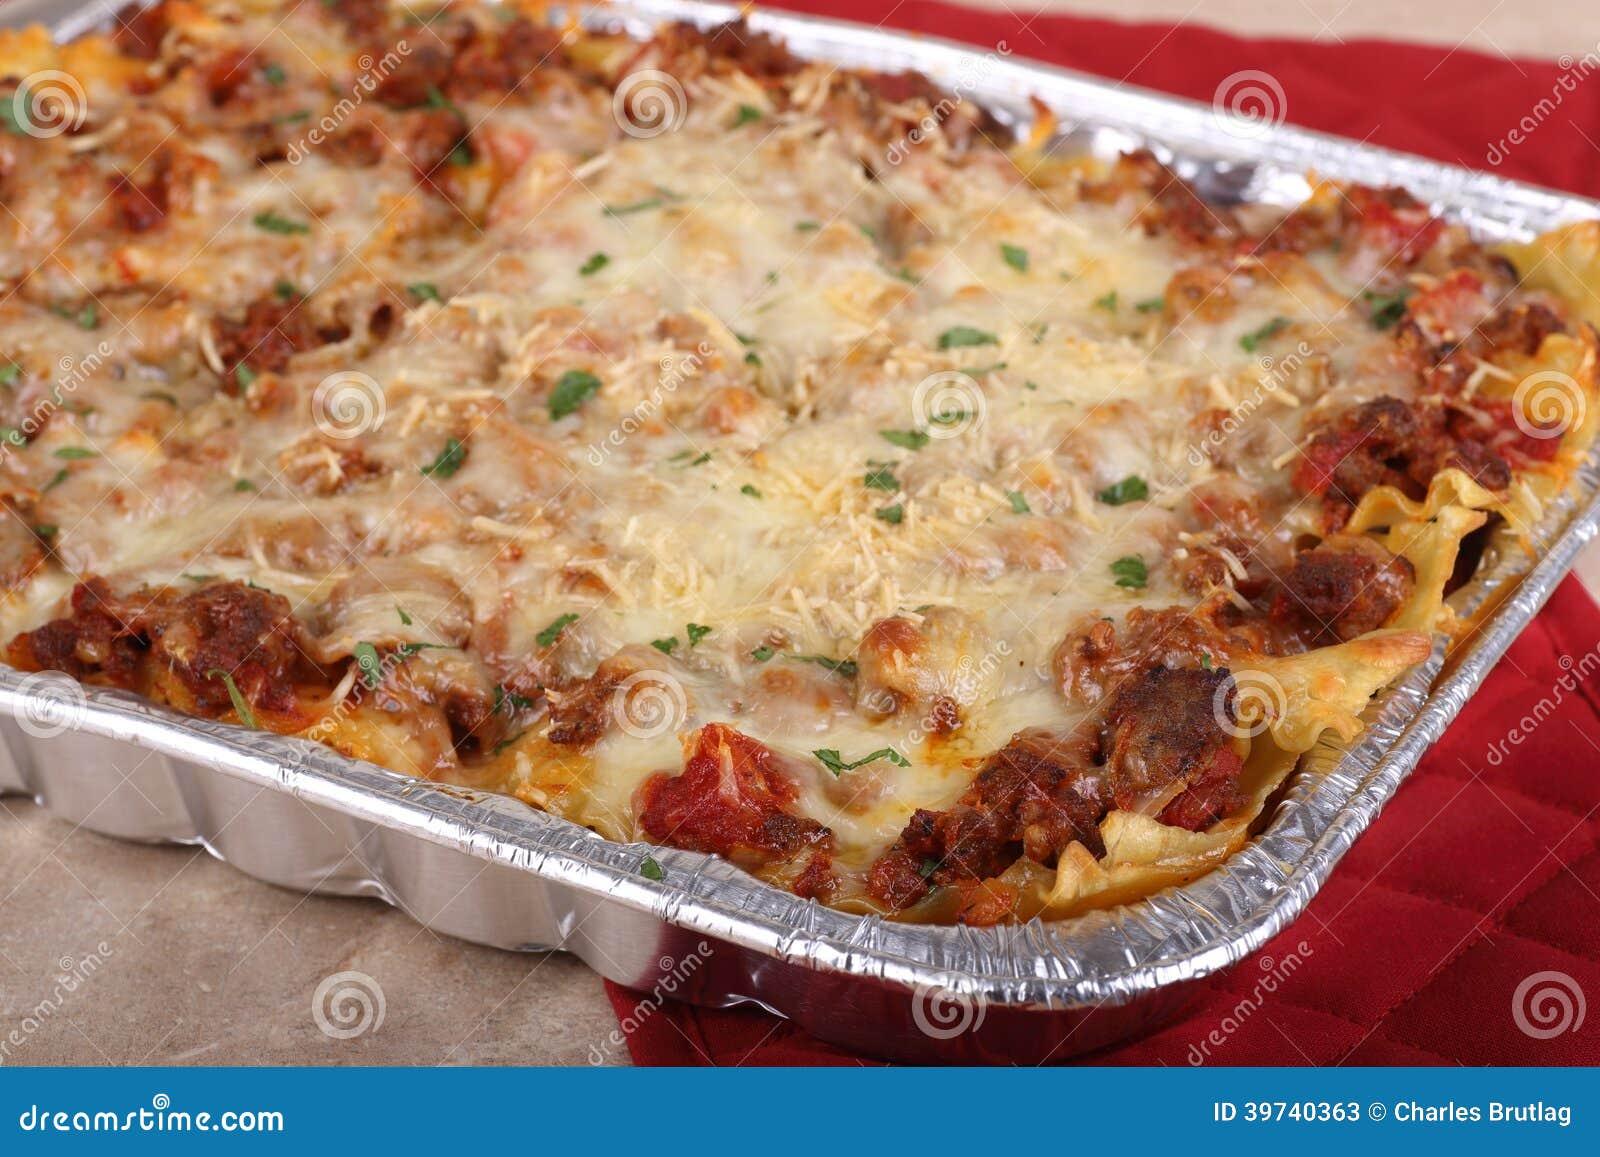 Pan Of Lasagna Stock Image Image Of Meal Cheesy Nobody